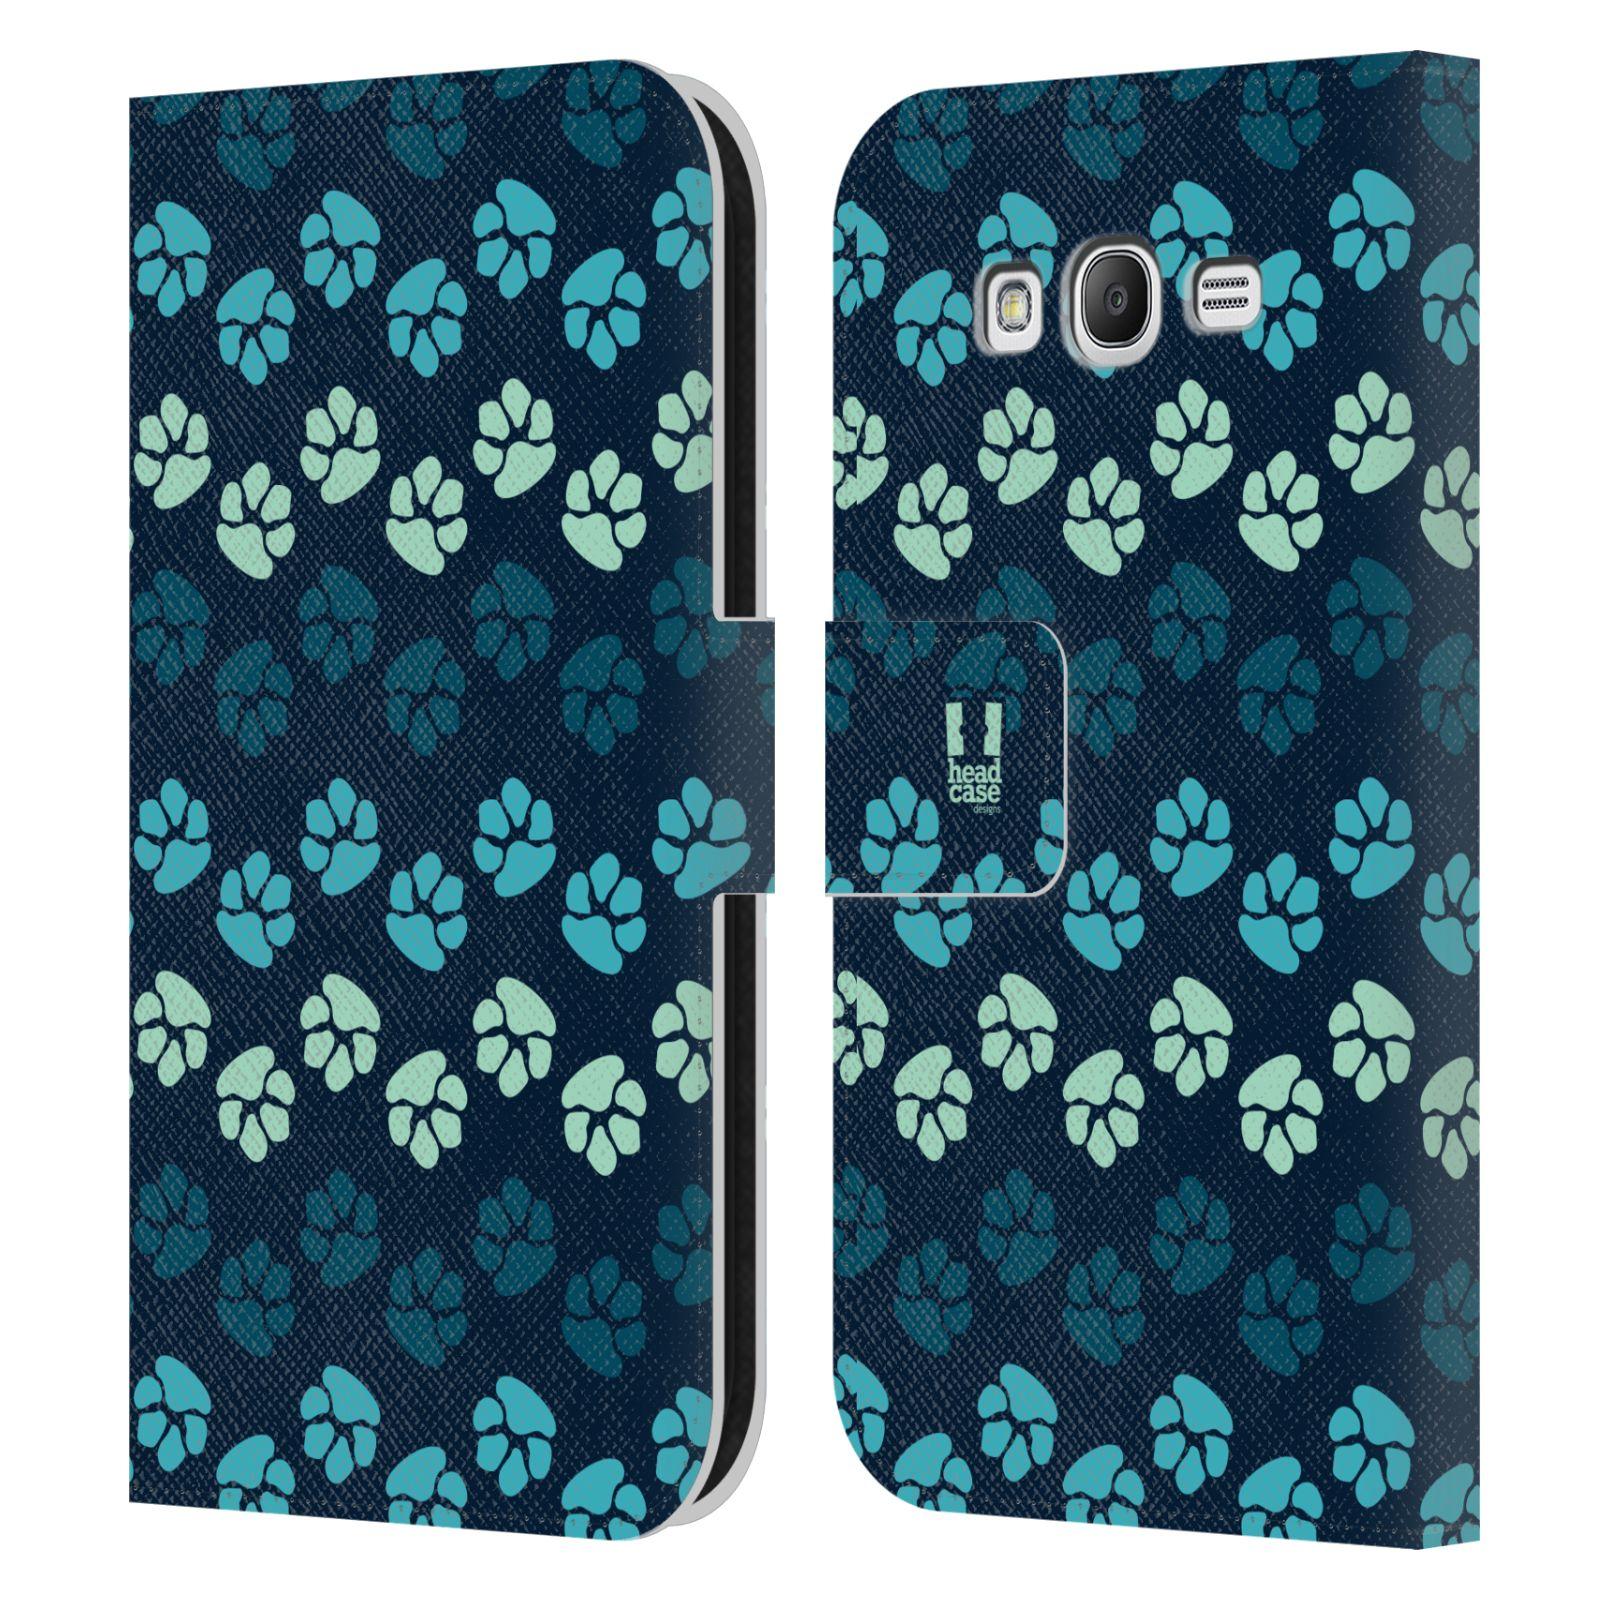 HEAD CASE Flipové pouzdro pro mobil Samsung Galaxy Grand i9080 Pejsek ťapky modrá barva